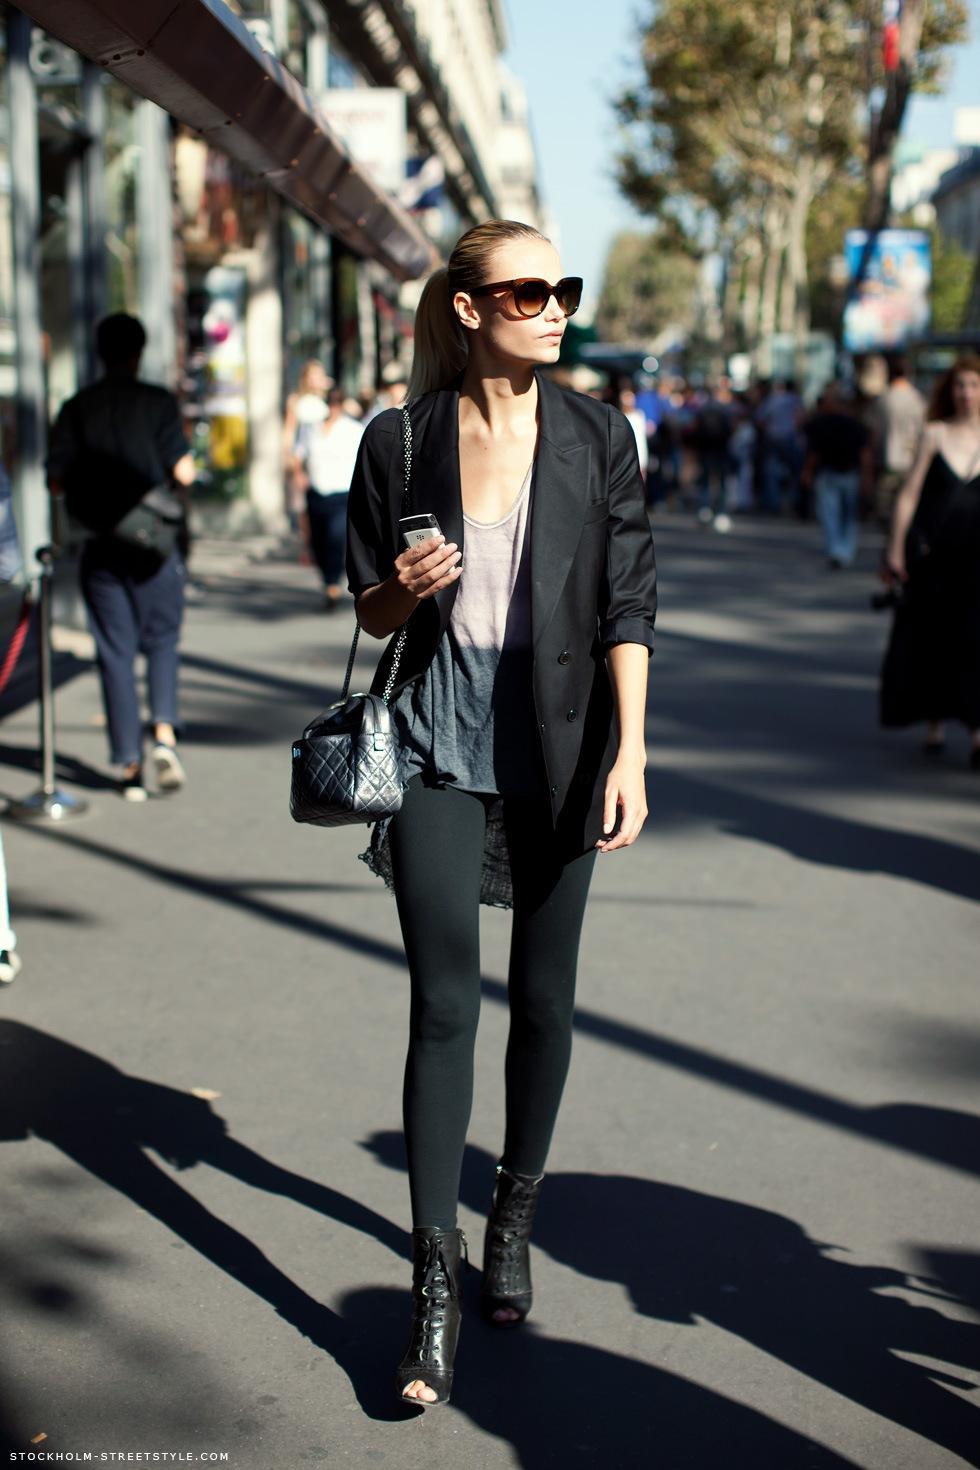 street-style-ponytail